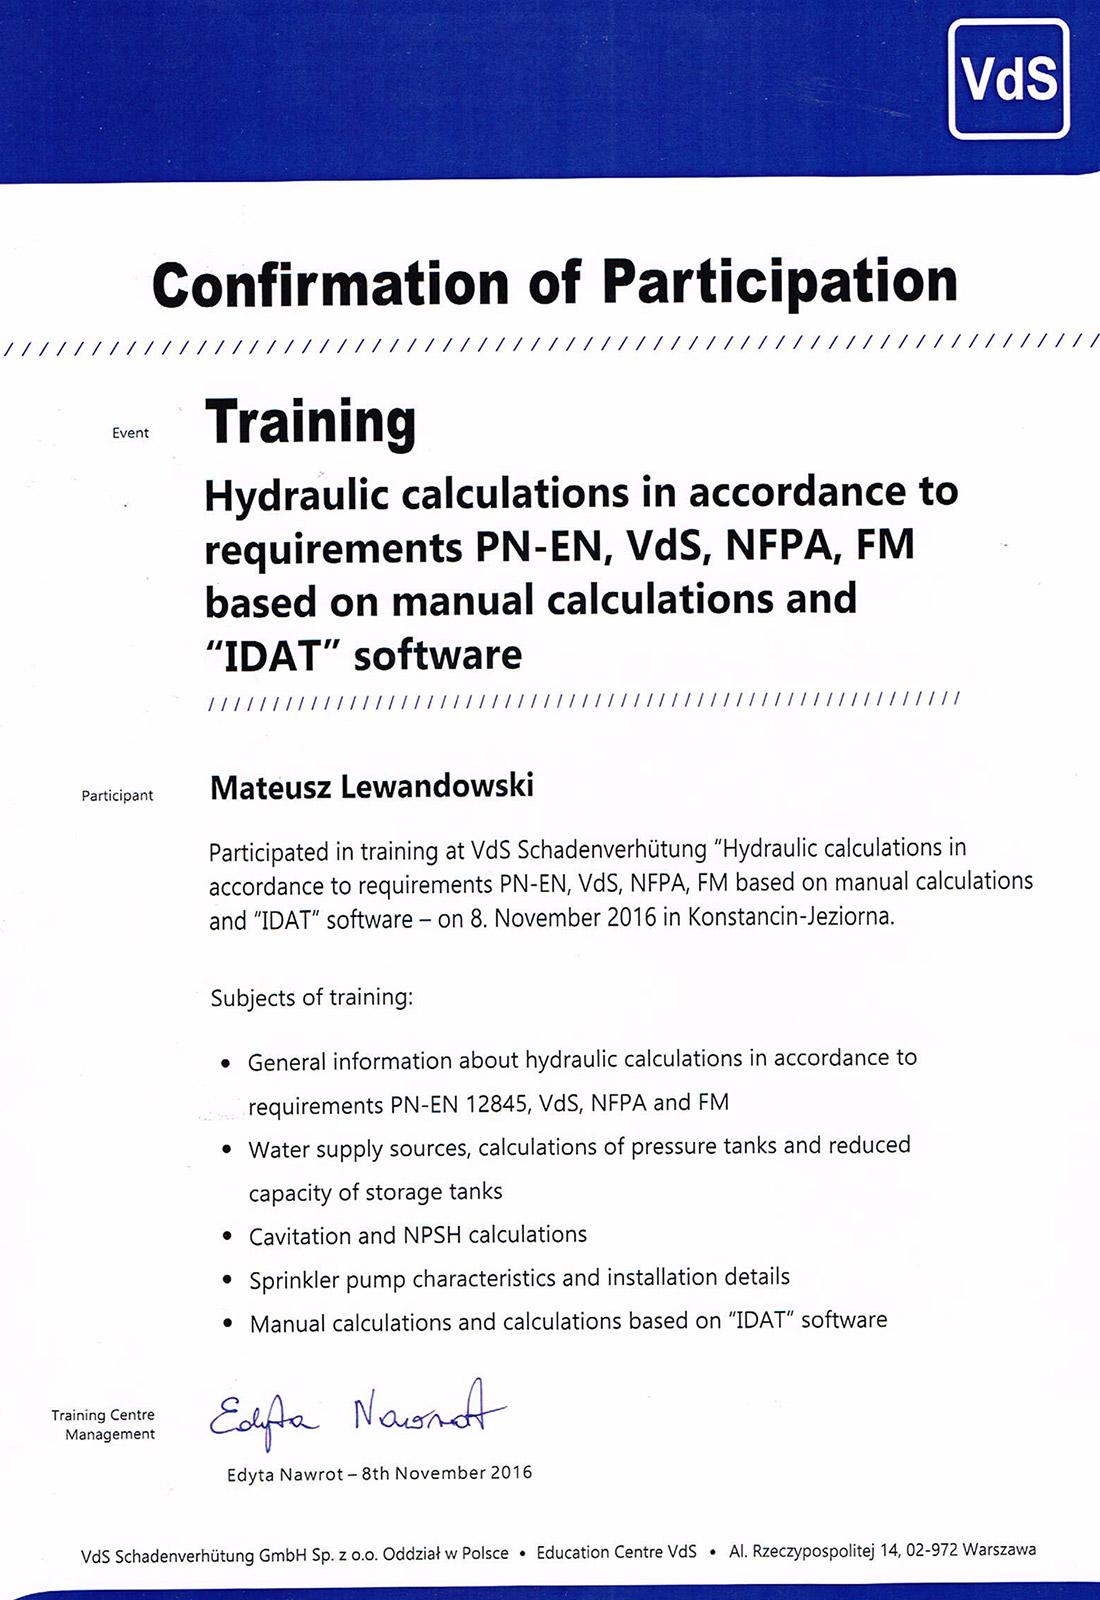 confirmation_hydraulic_calc_lewandowski_mateusz